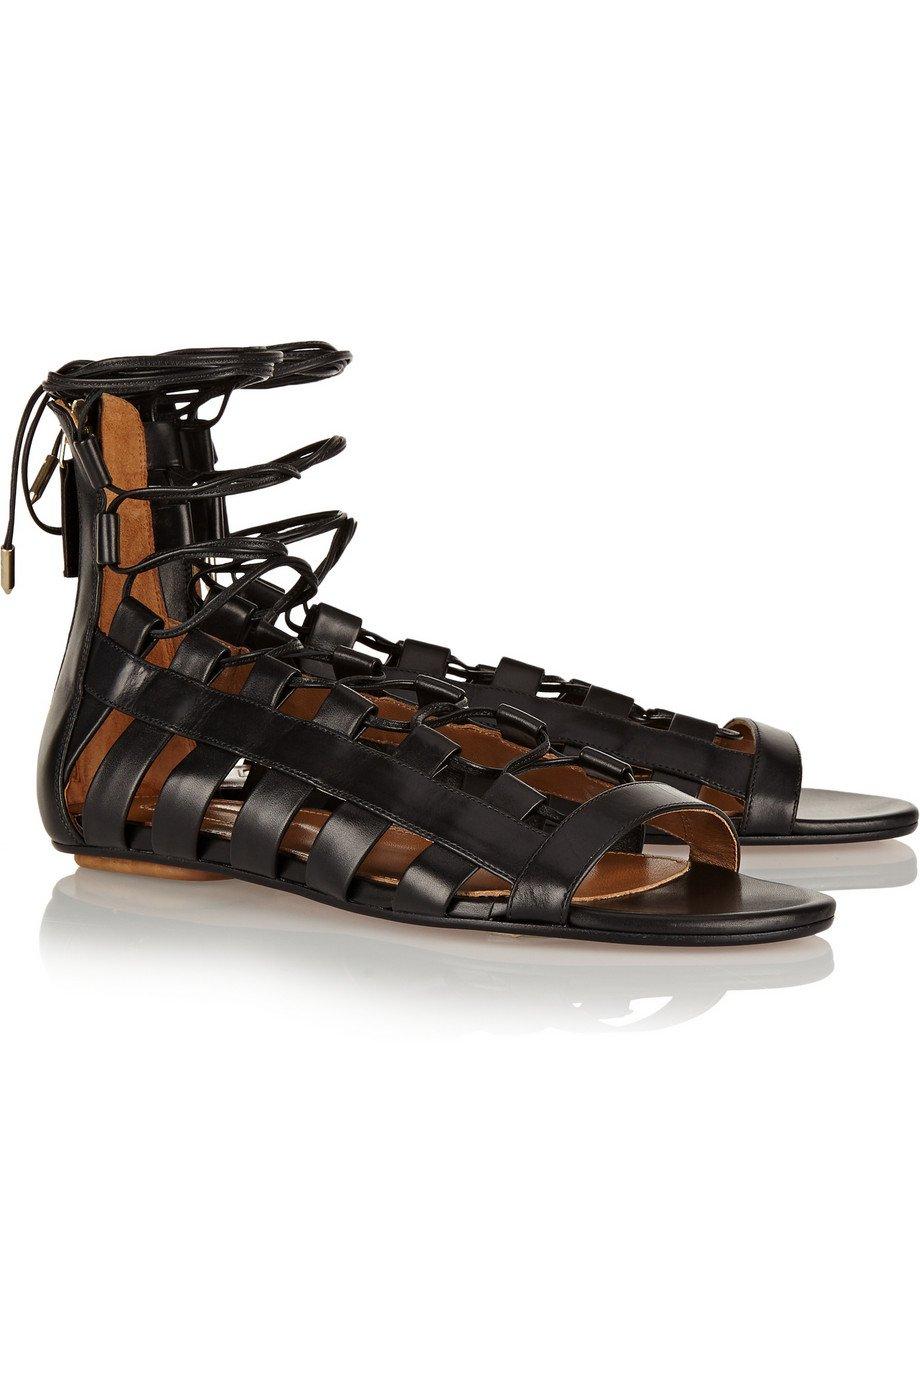 Black sandals on amazon - Gallery